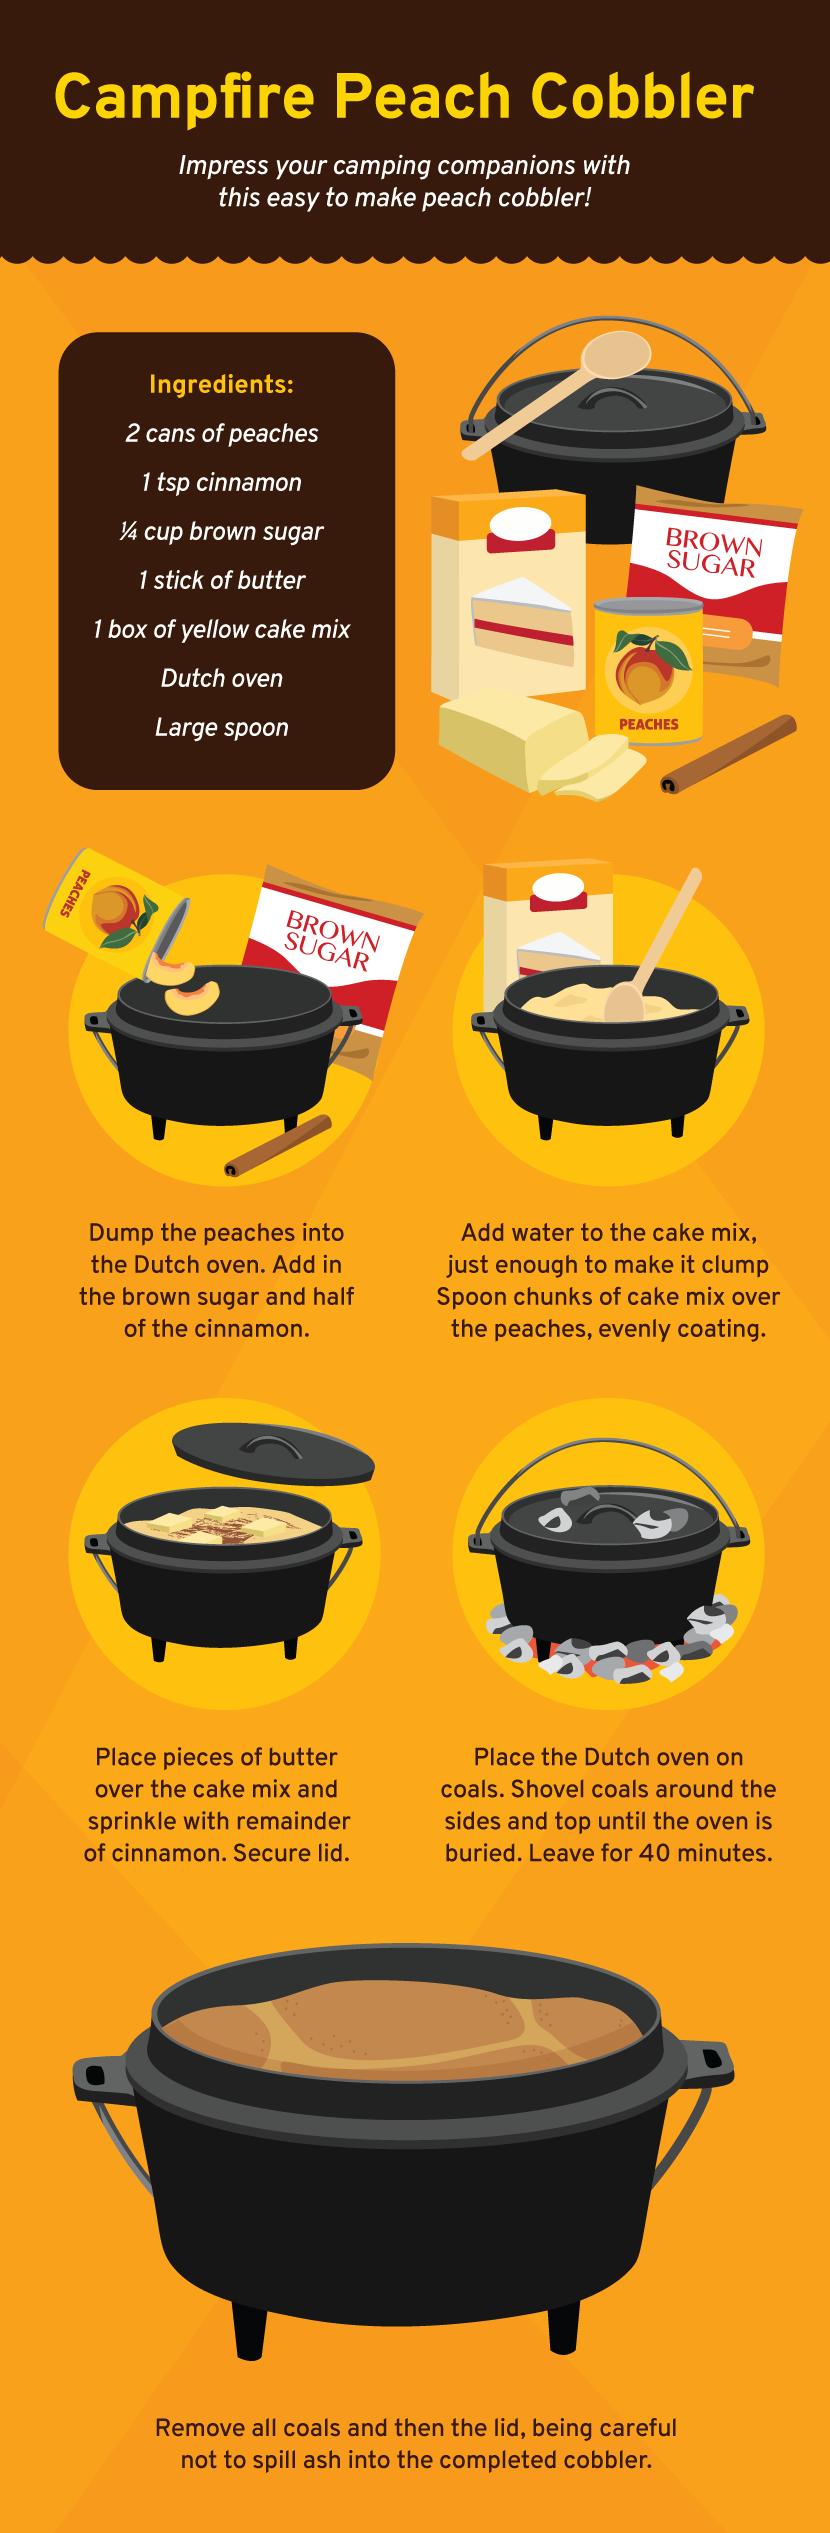 Campfire Peach Cobbler - Cooking on a Campfire